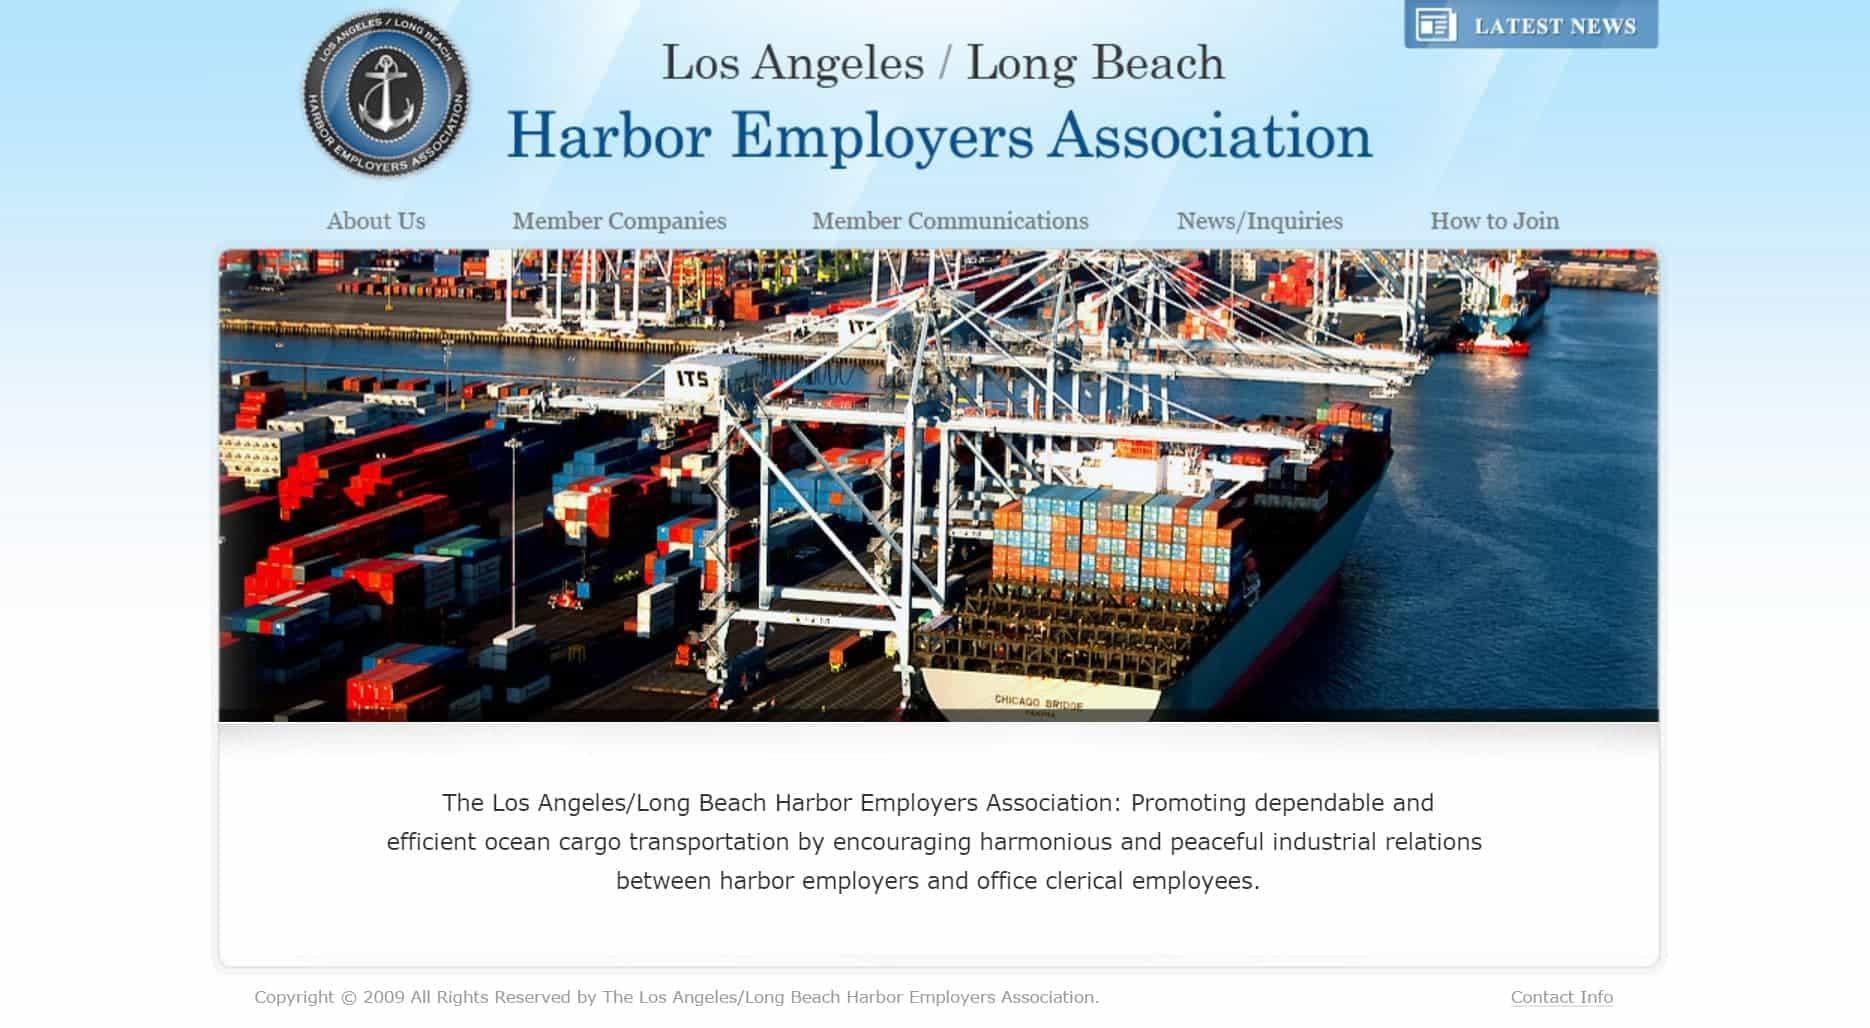 Harbor Employers Association